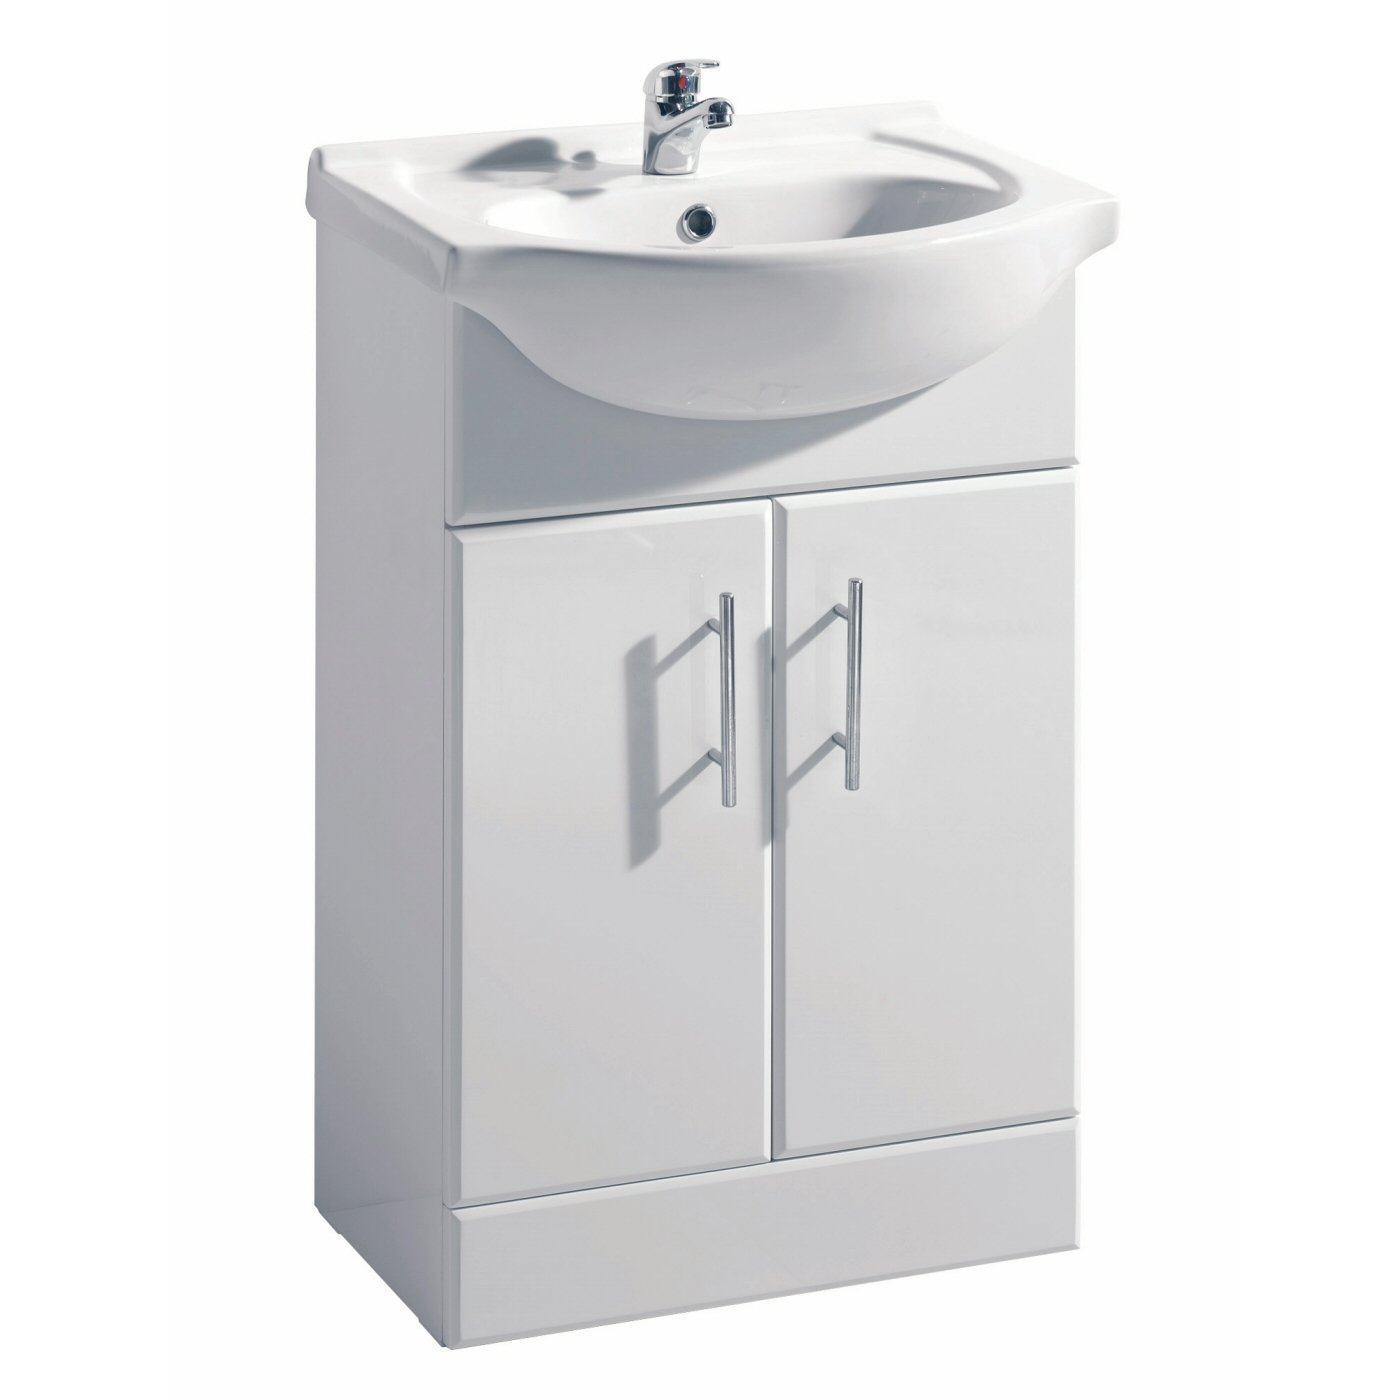 veebath linx bathroom white gloss vanity unit basin sink 450mm storage unit cabinet ceramic furniture amazoncouk kitchen u0026 home